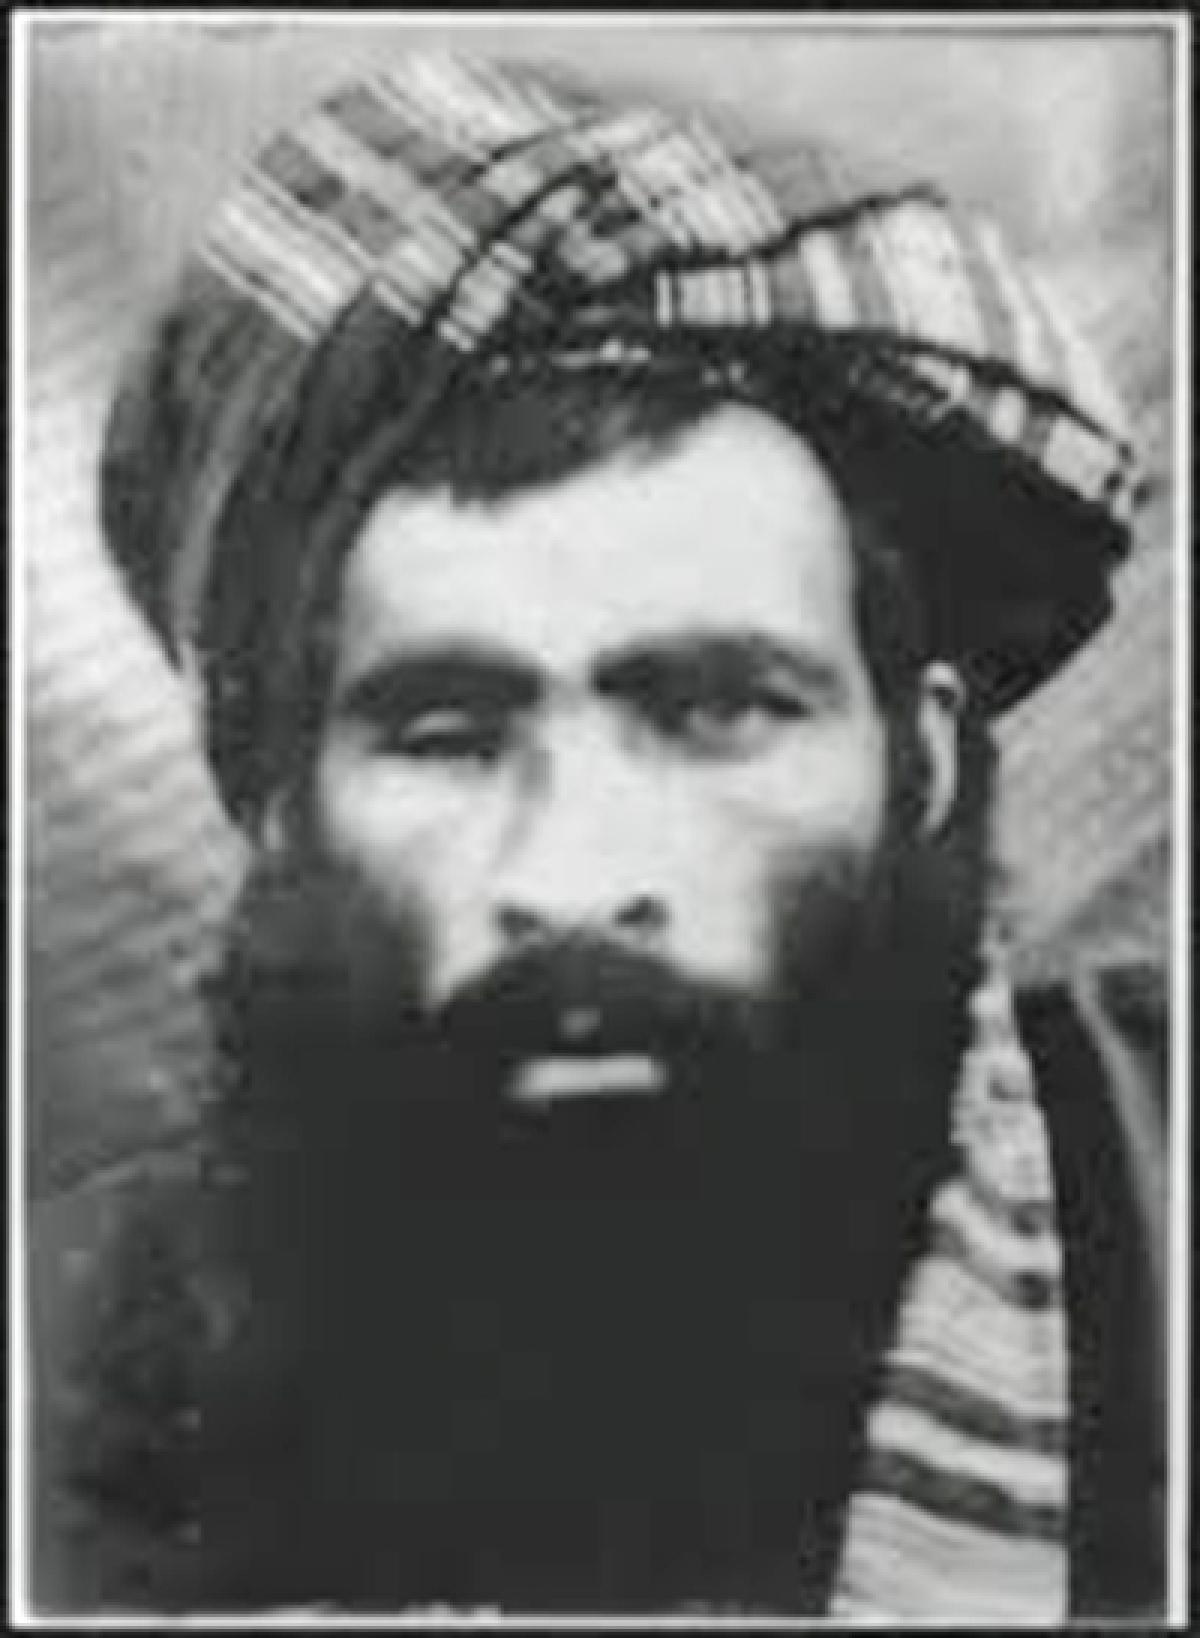 Kabul probing Mullah Omar death reports